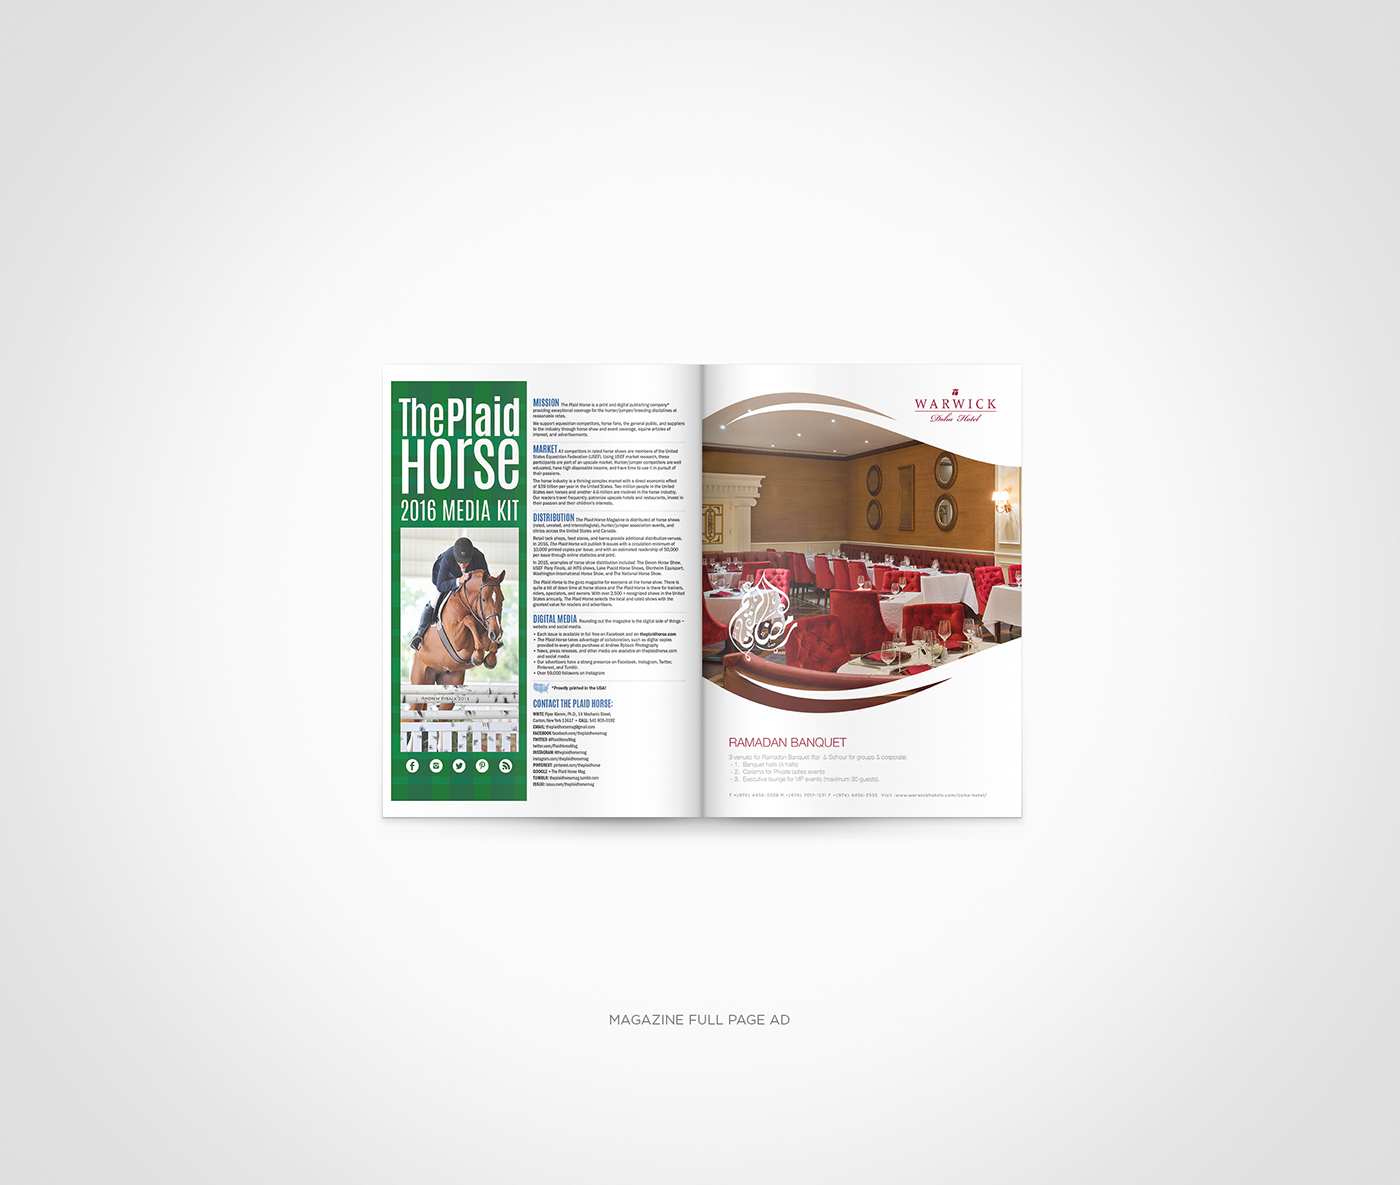 Warwick Doha Hotel adverising Saeed elgarf arabic hotel branding